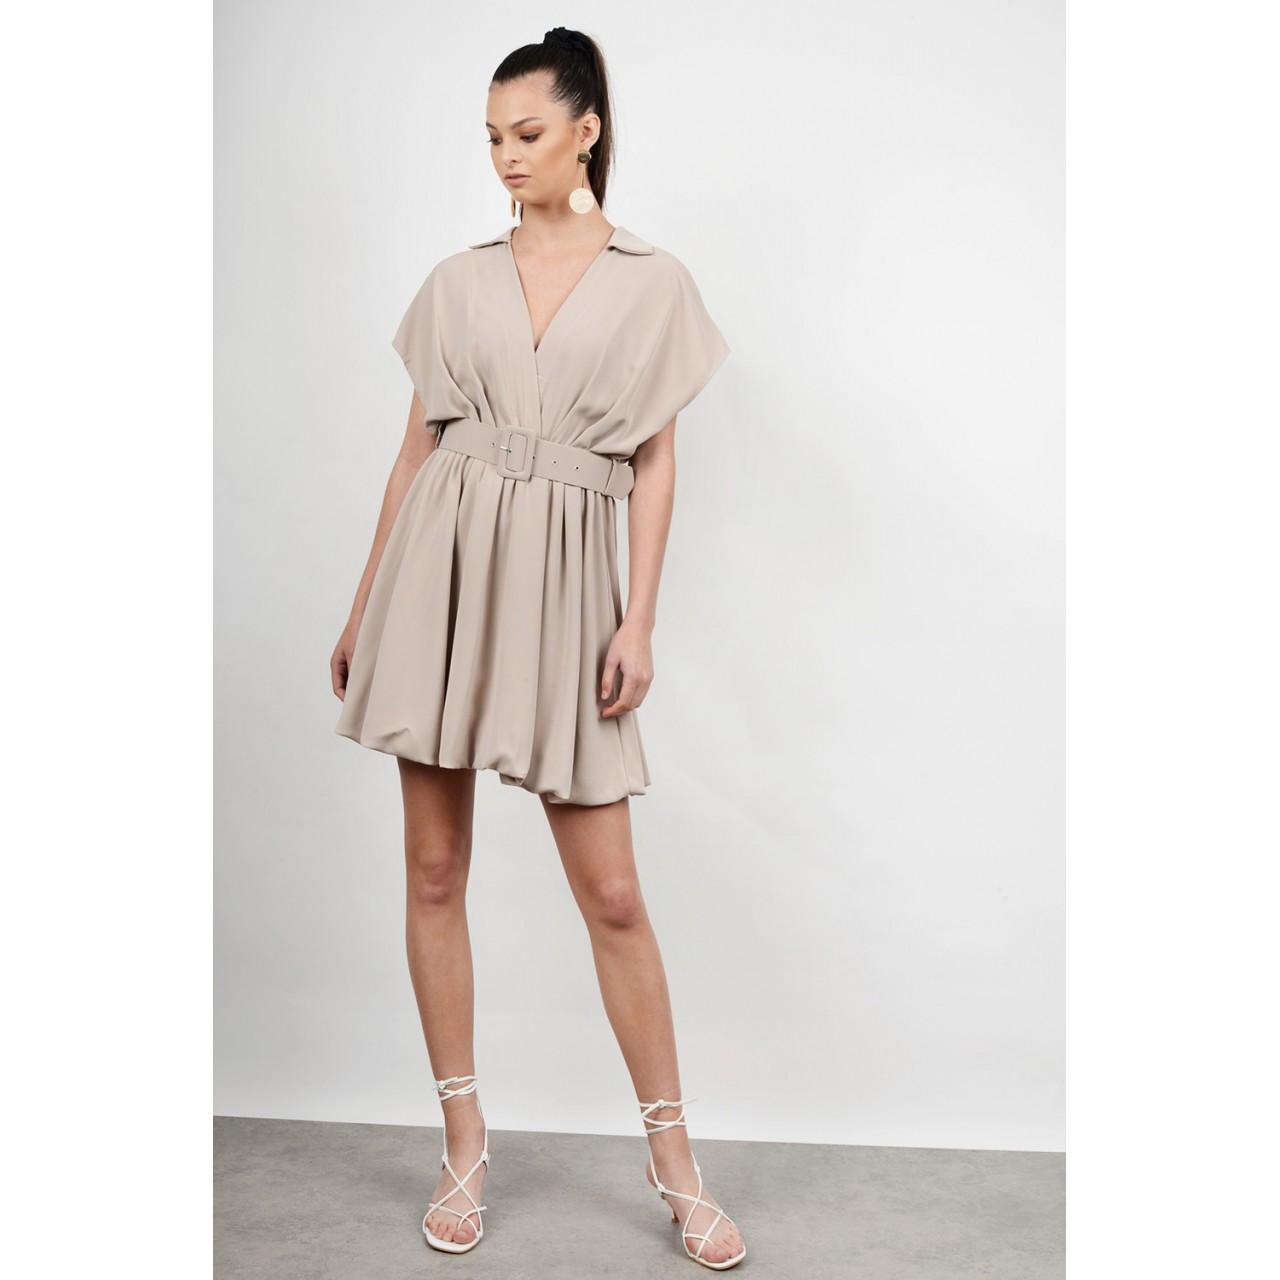 Mini dress with belt